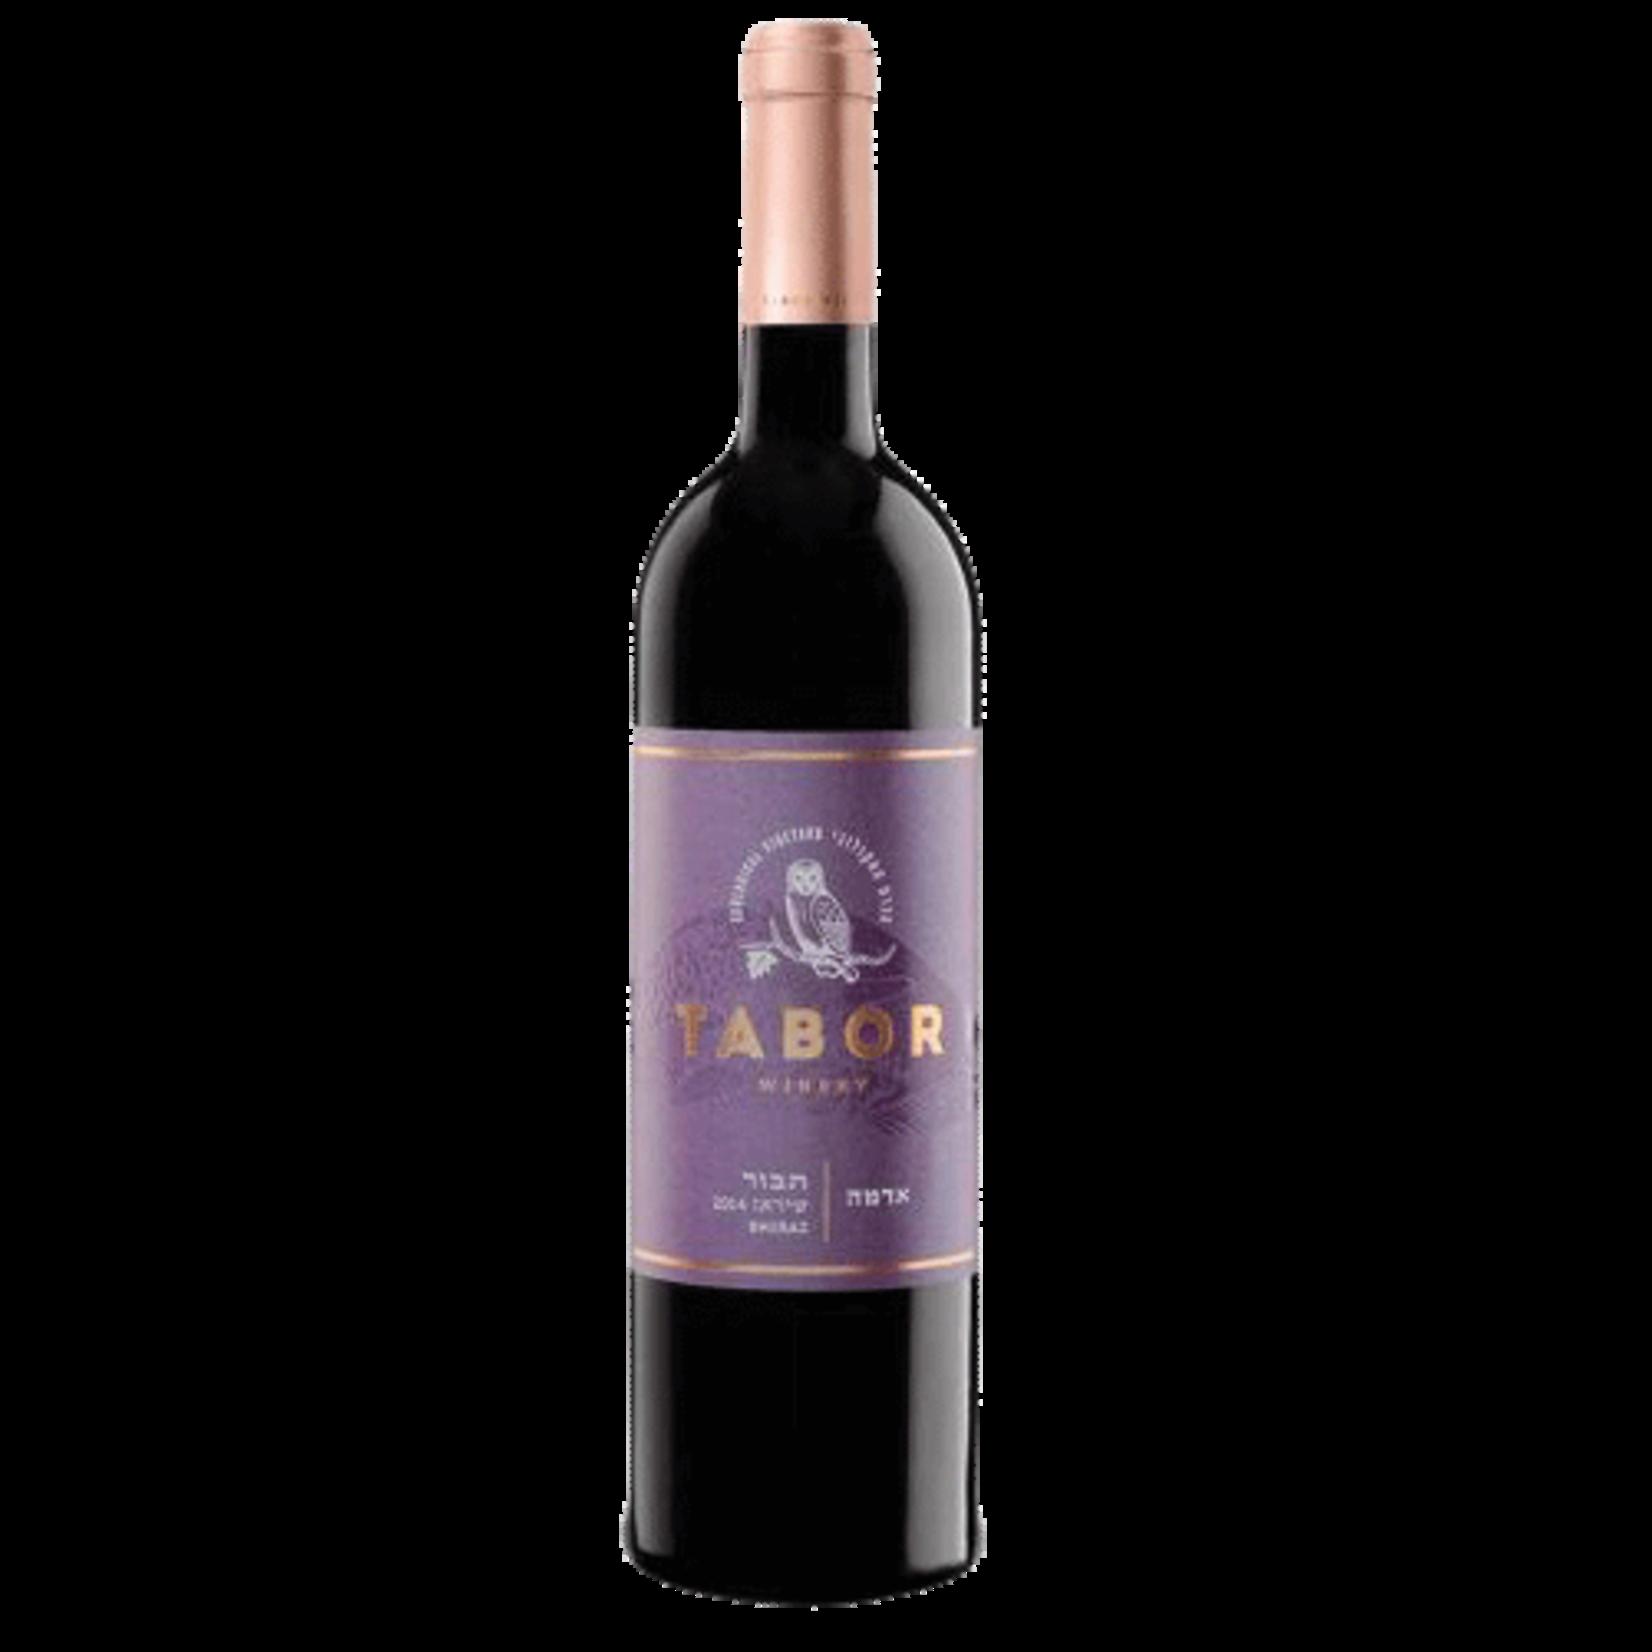 Wine Mt Tabor Adama Shiraz 2014 Kosher